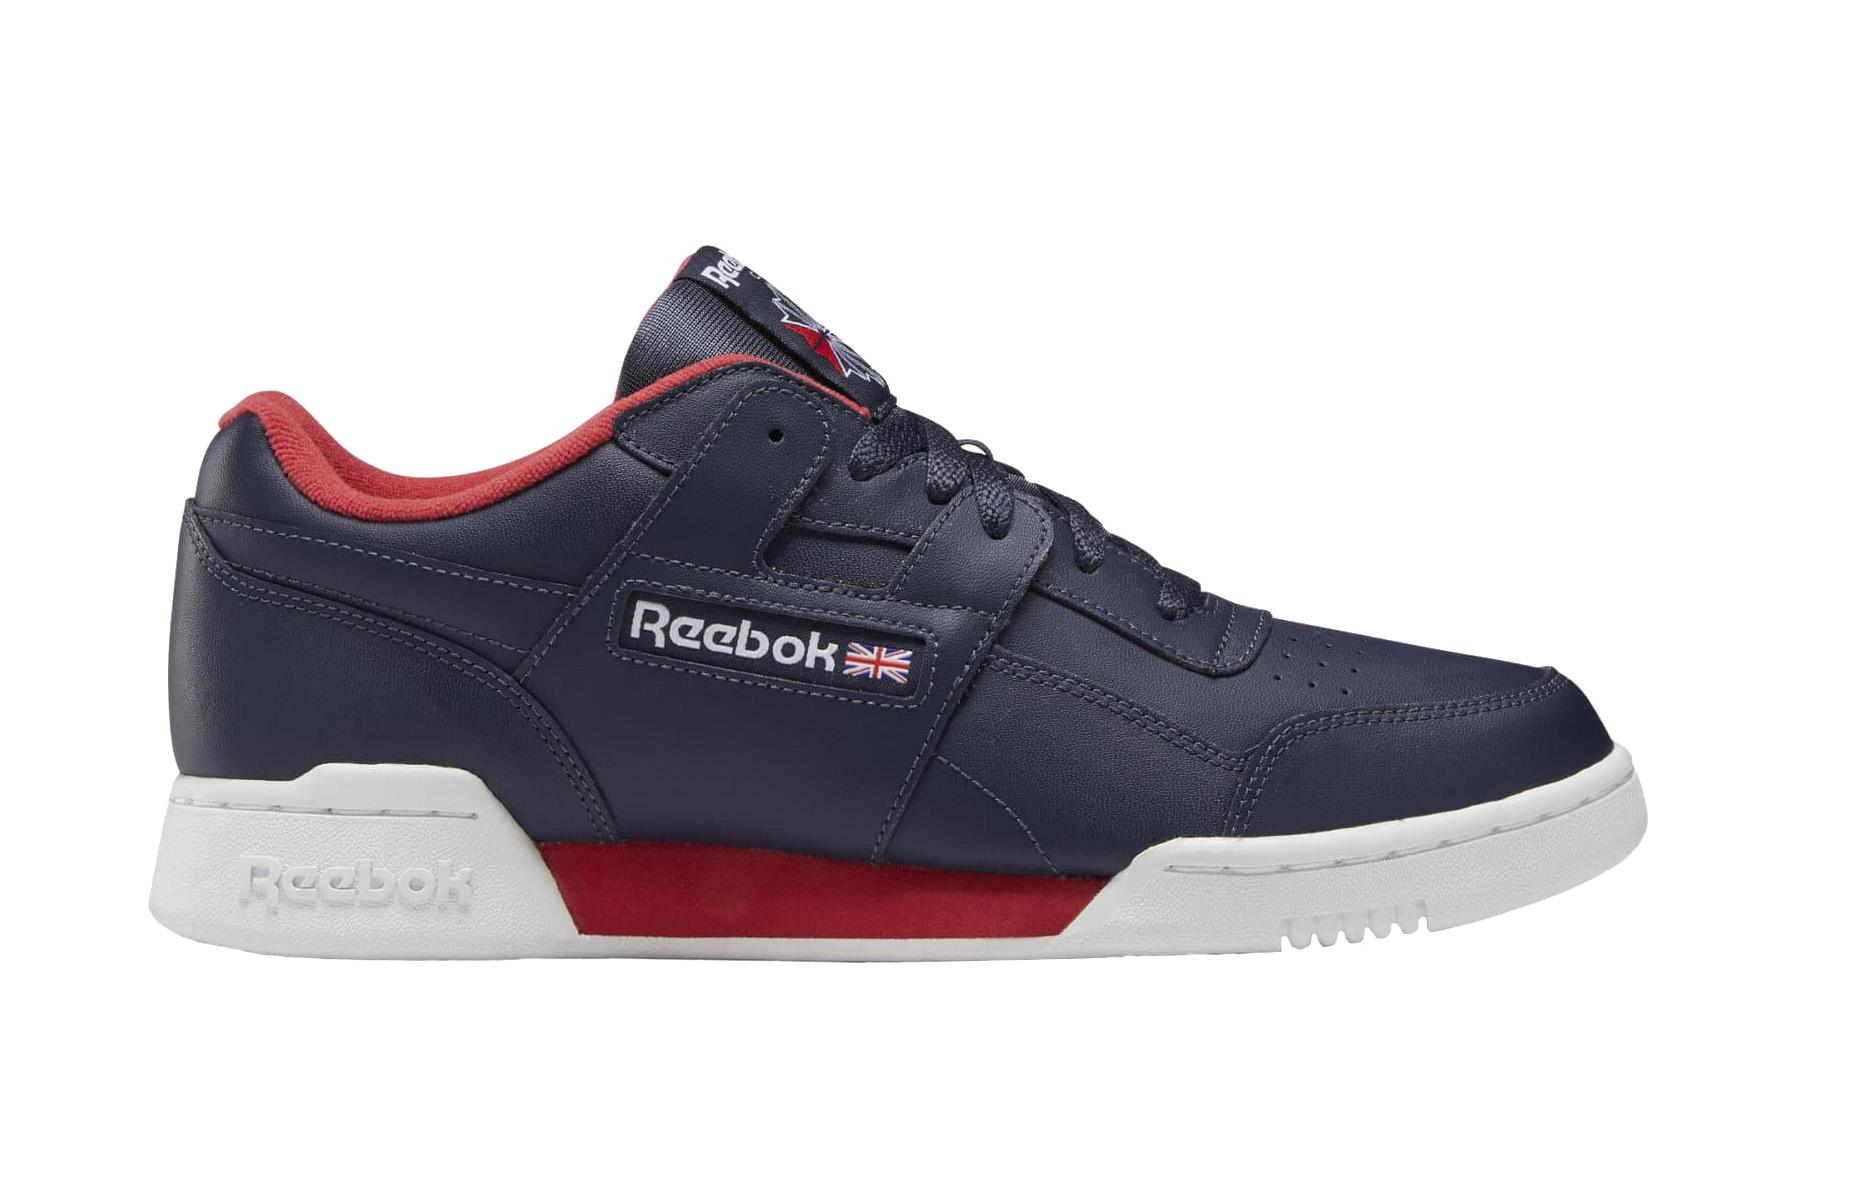 Кроссовки Reebok Workout Plus, blue/heritage navy/white/rebel red, 9.5 US фото